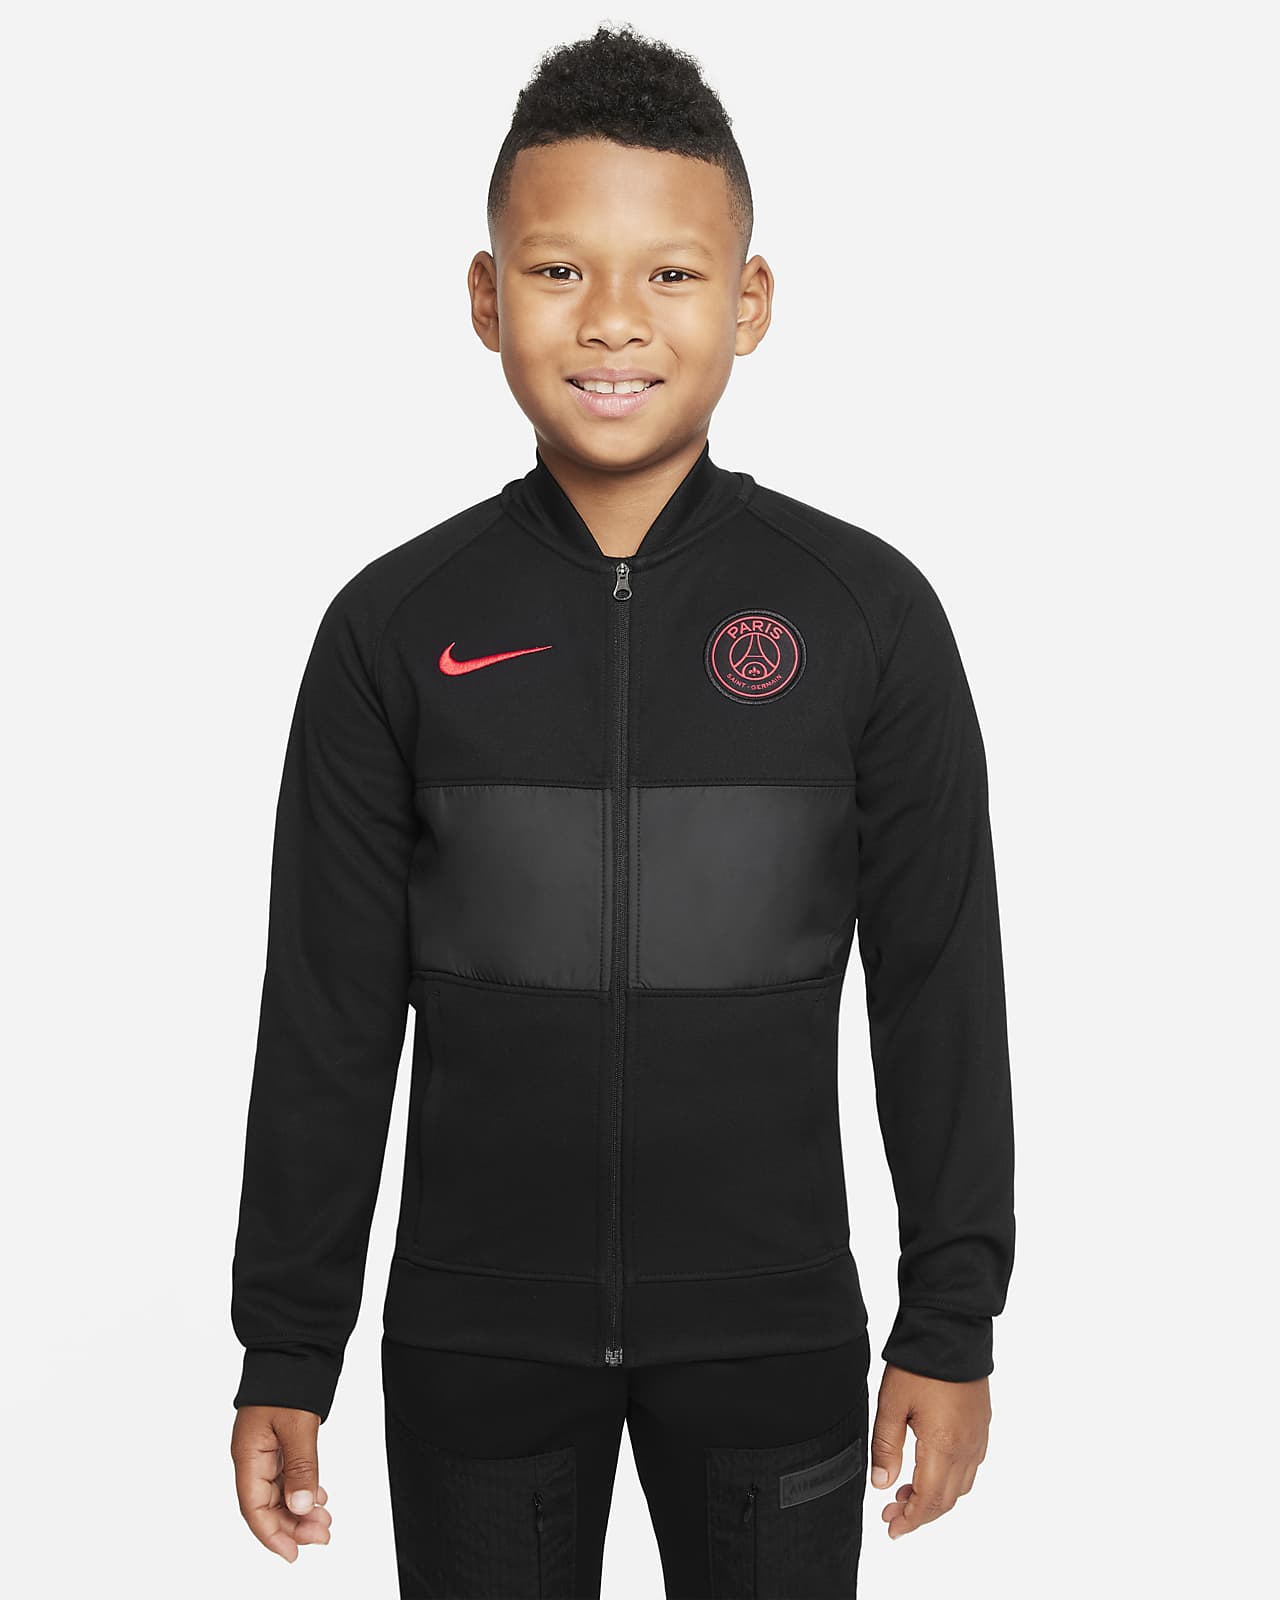 Paris Saint-Germain Older Kids' Nike Dri-FIT Football Tracksuit Jacket